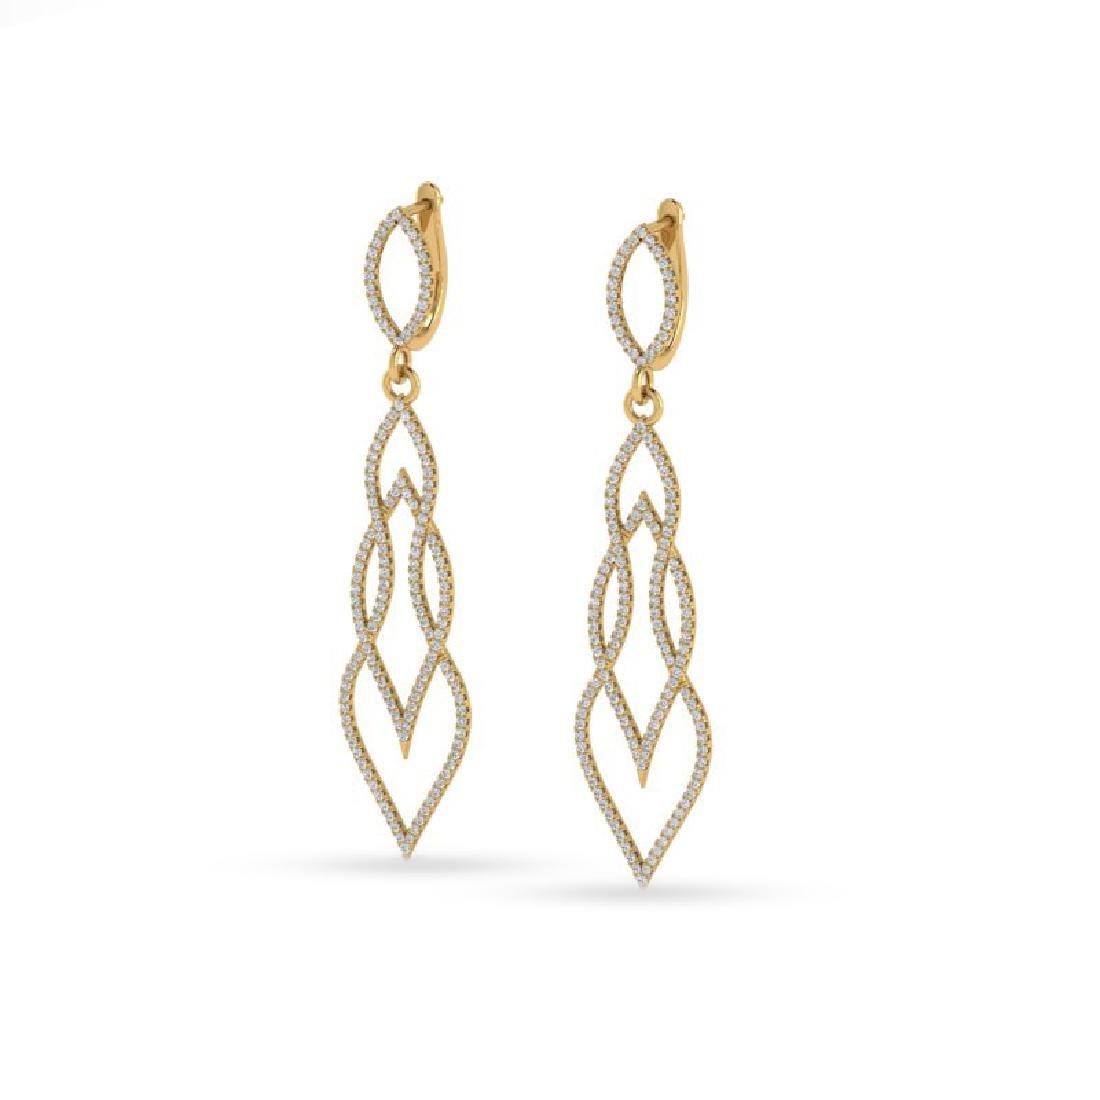 1.90 CTW Micro Pave VS/SI Diamond Earrings 14K Yellow